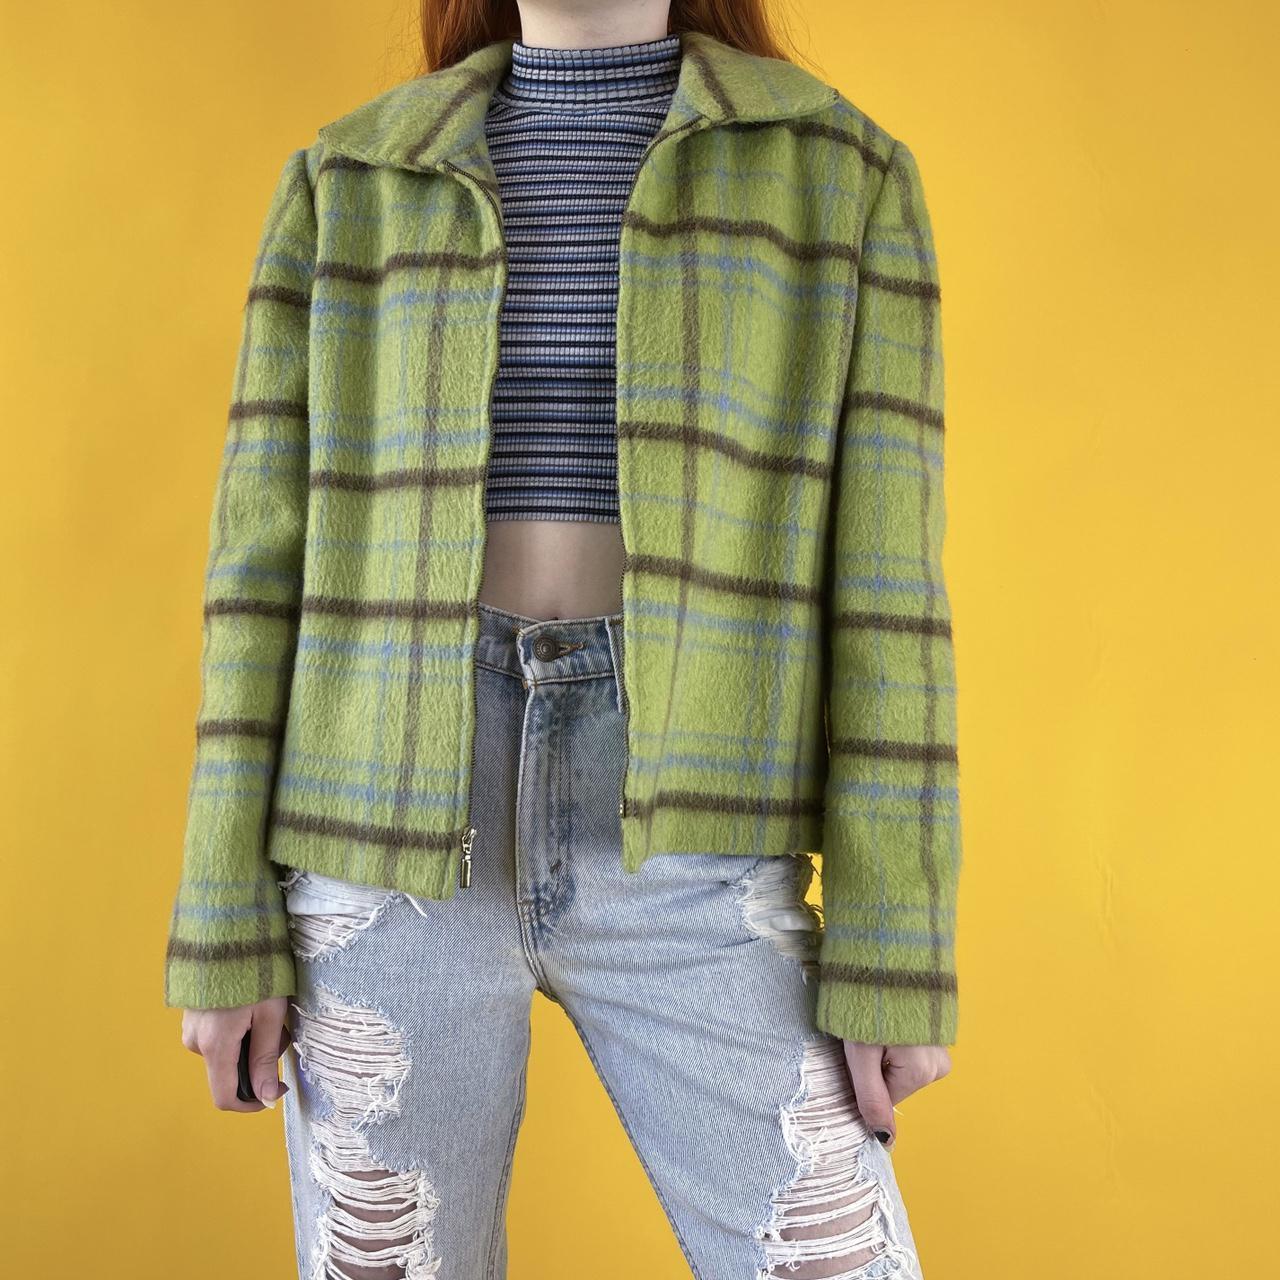 Product Image 1 - vintage plaid jacket 💚 features